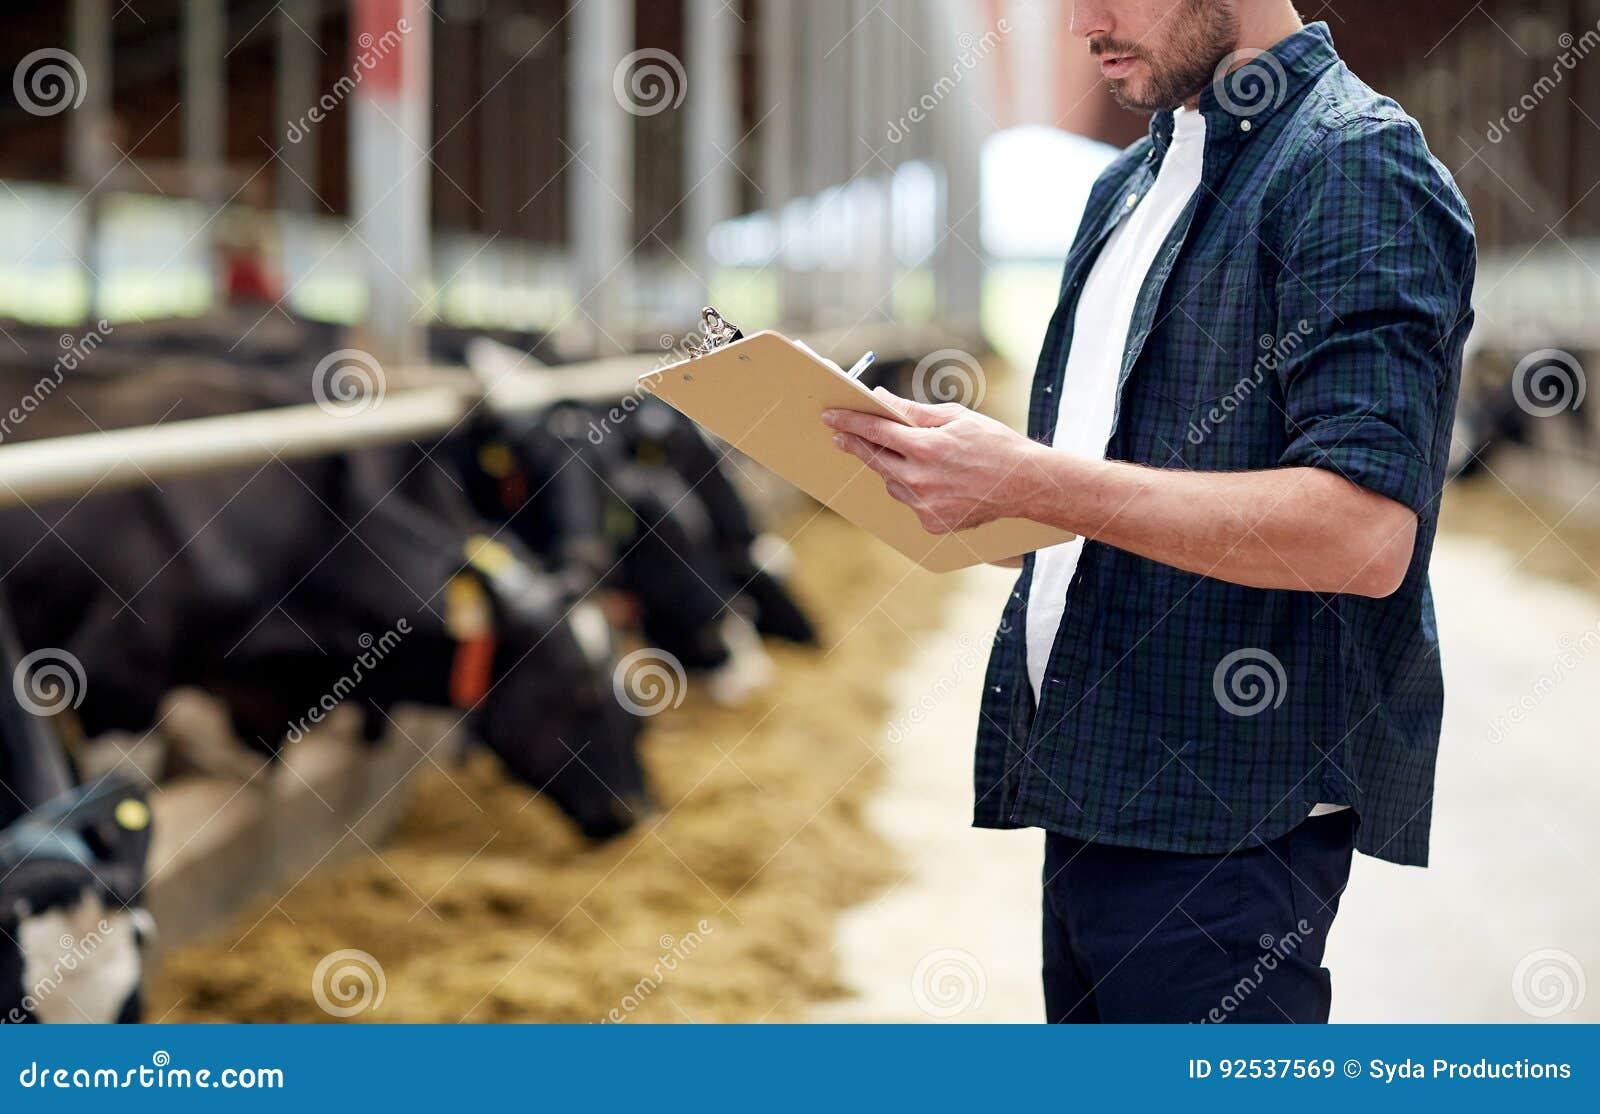 Landbouwer met klembord en koeien in koeiestal op landbouwbedrijf